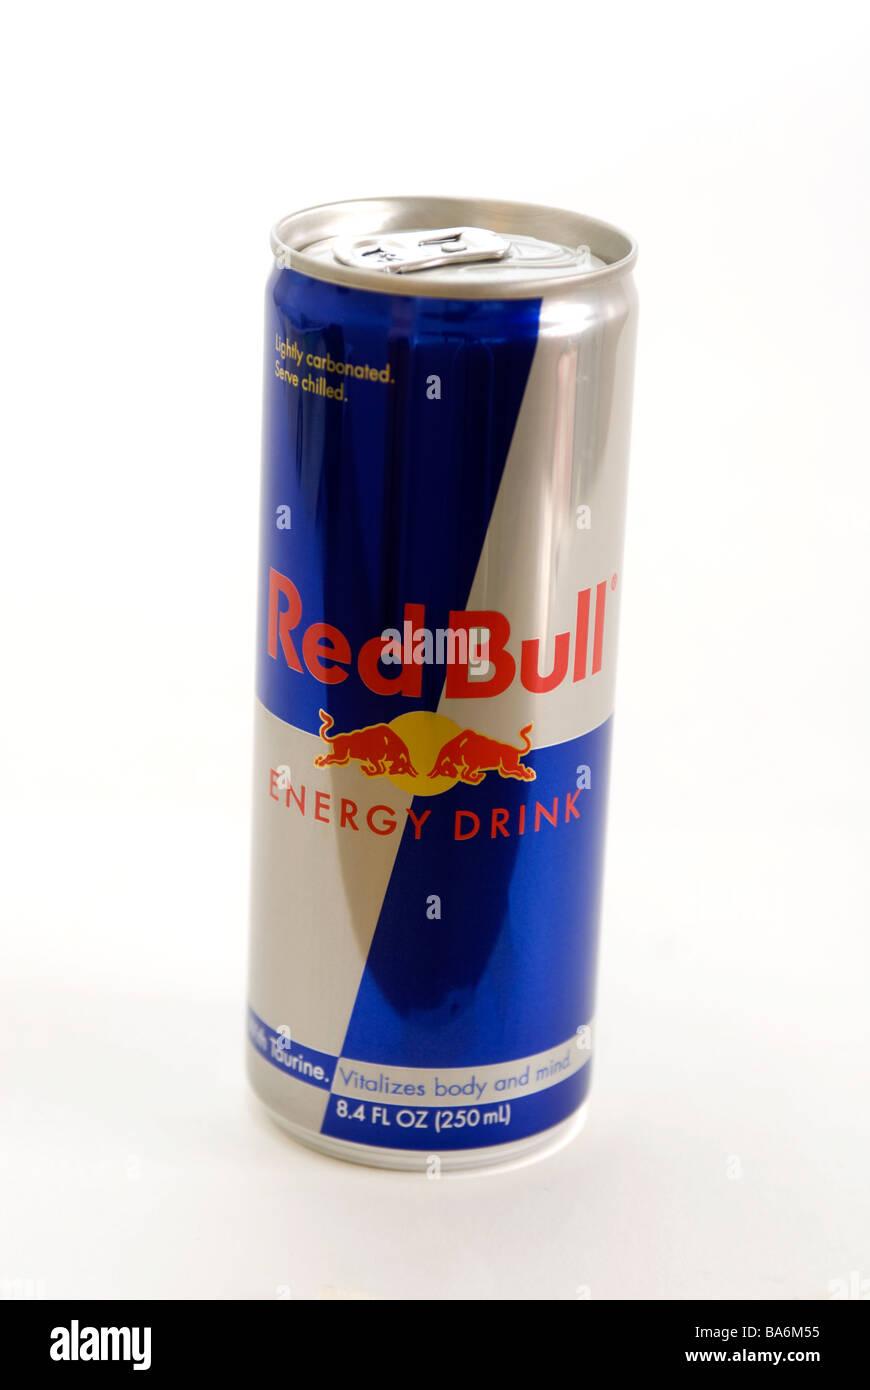 red bull energy drink stock photos red bull energy drink stock